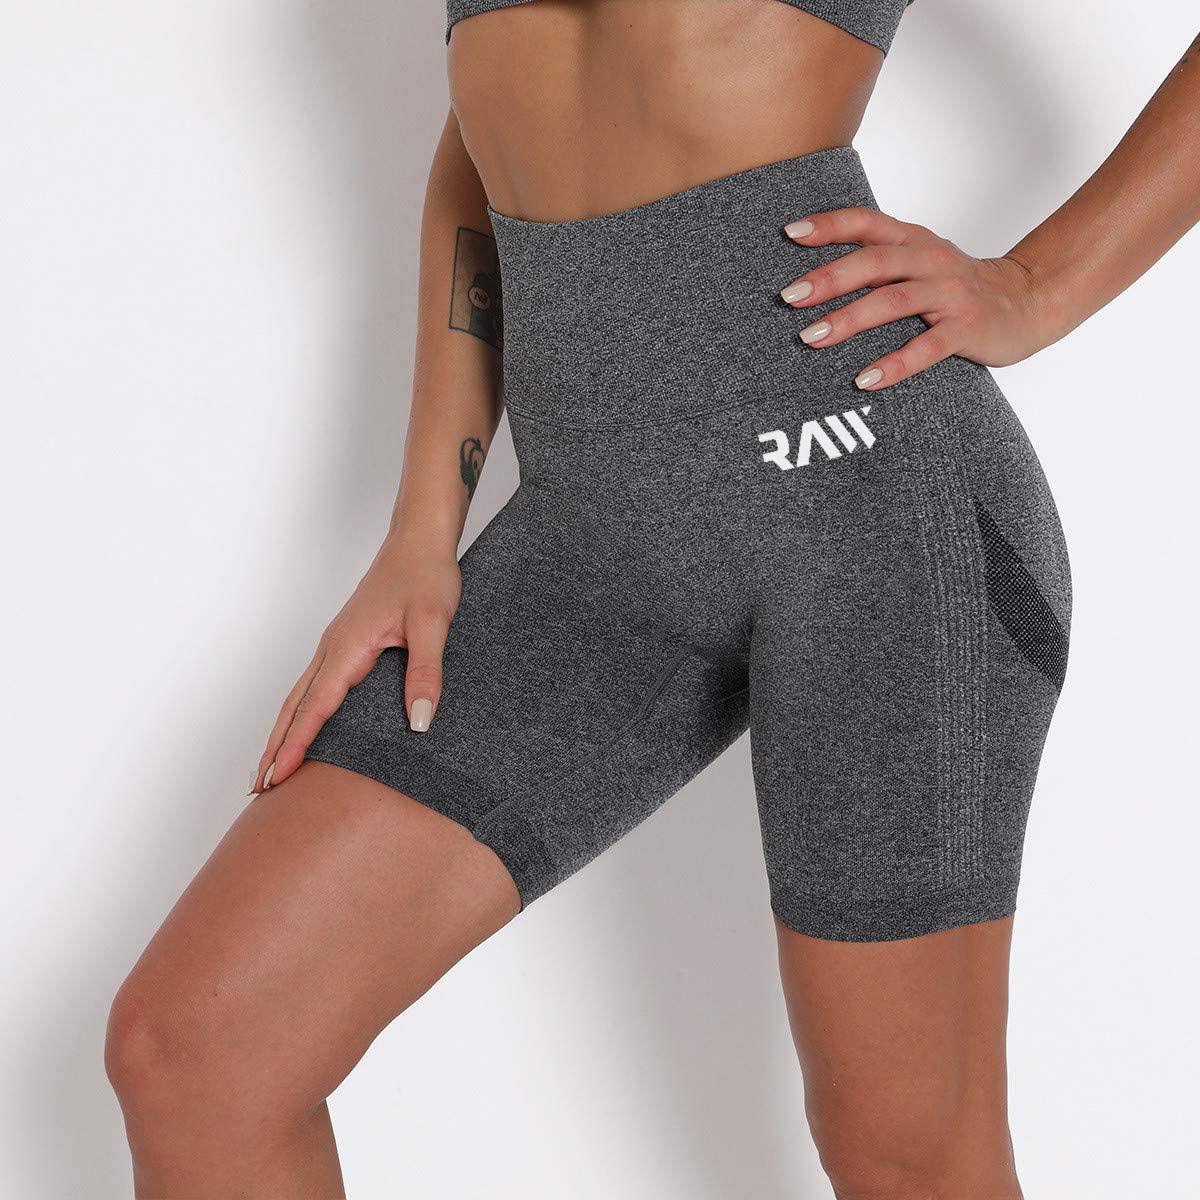 raw-shorts